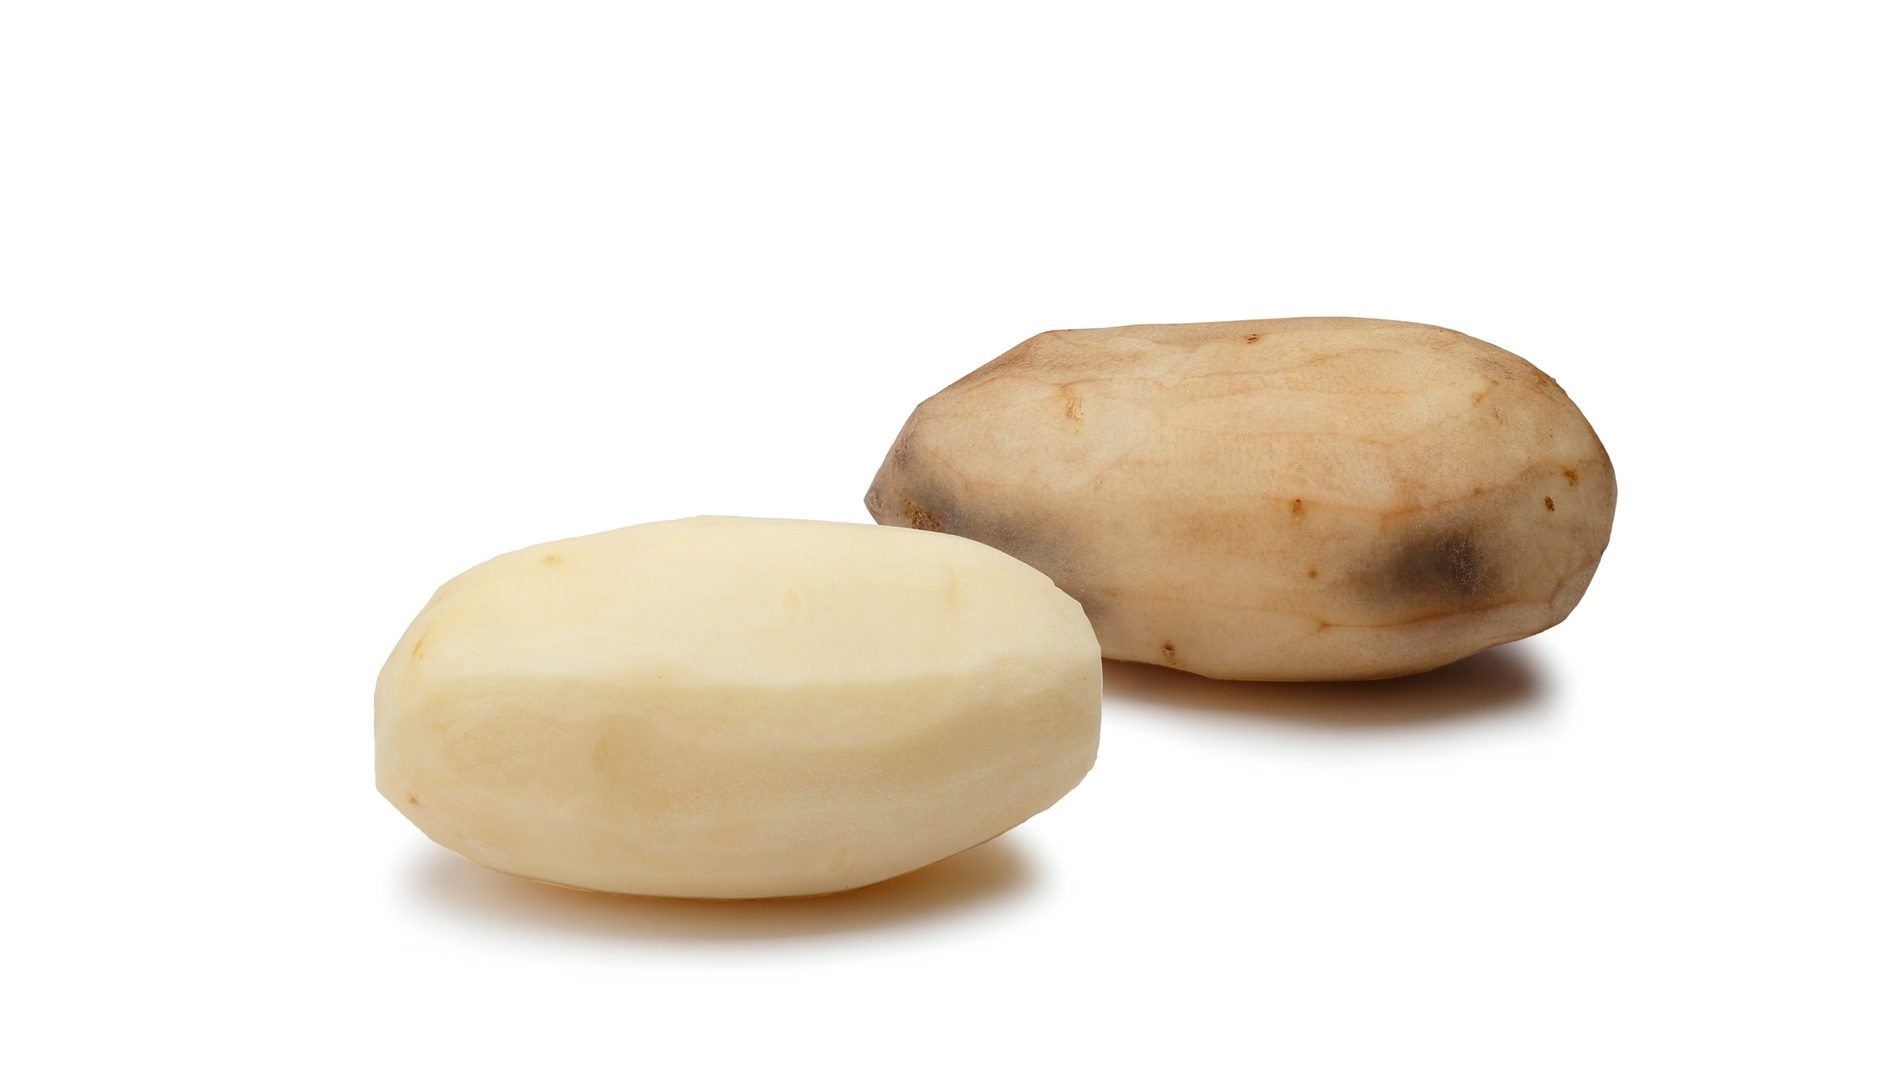 Una patata transgénica contra otra que no